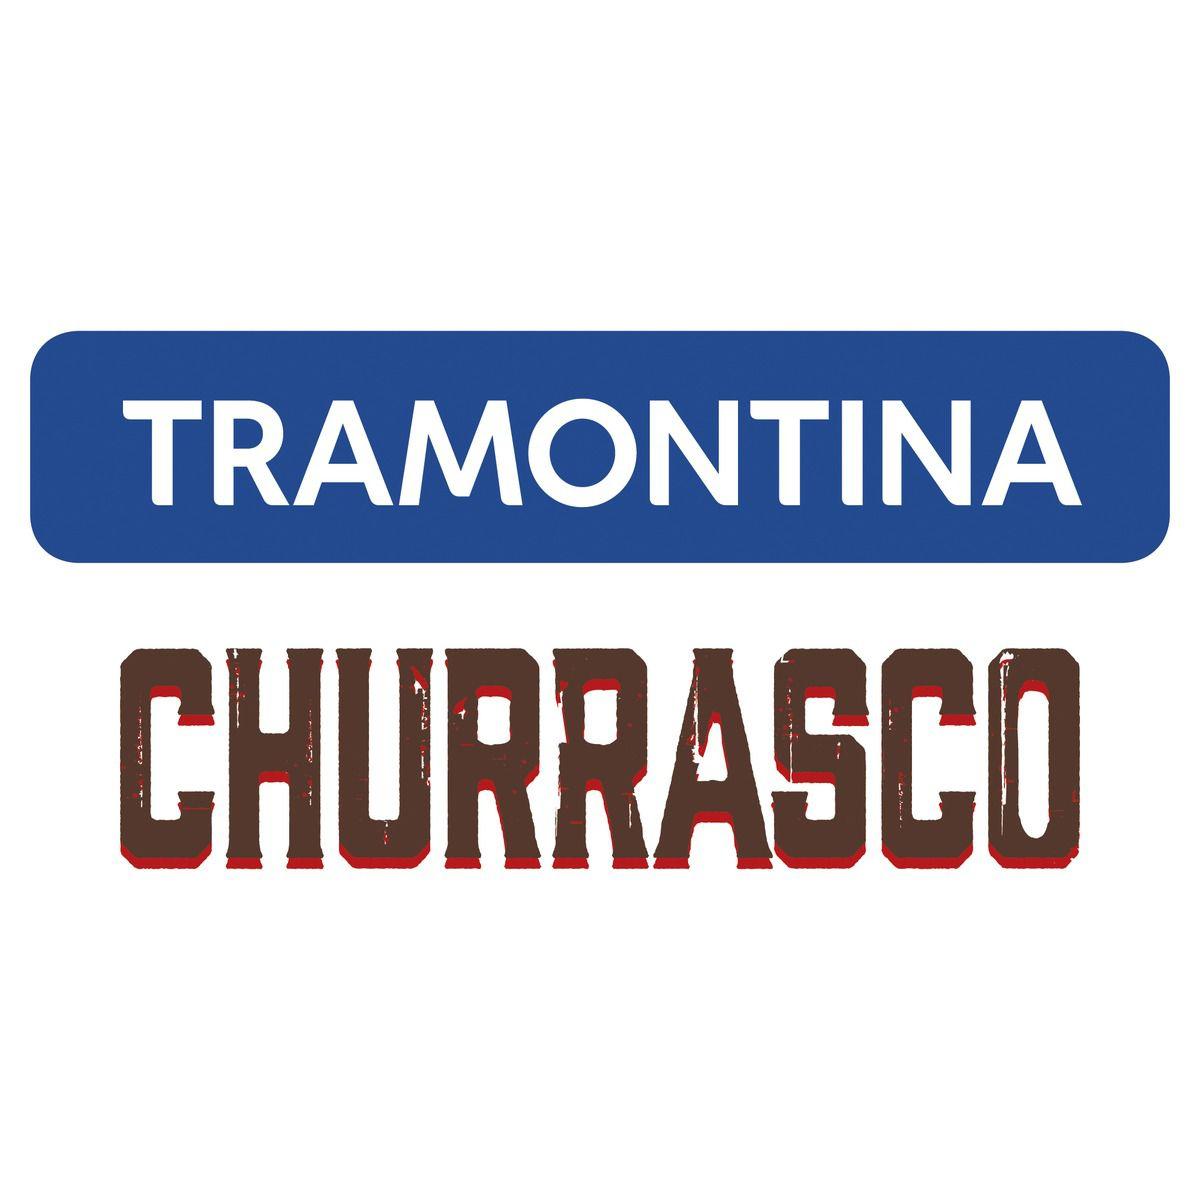 Kit Espeto Para Churrasco Tramontina 6 Peças